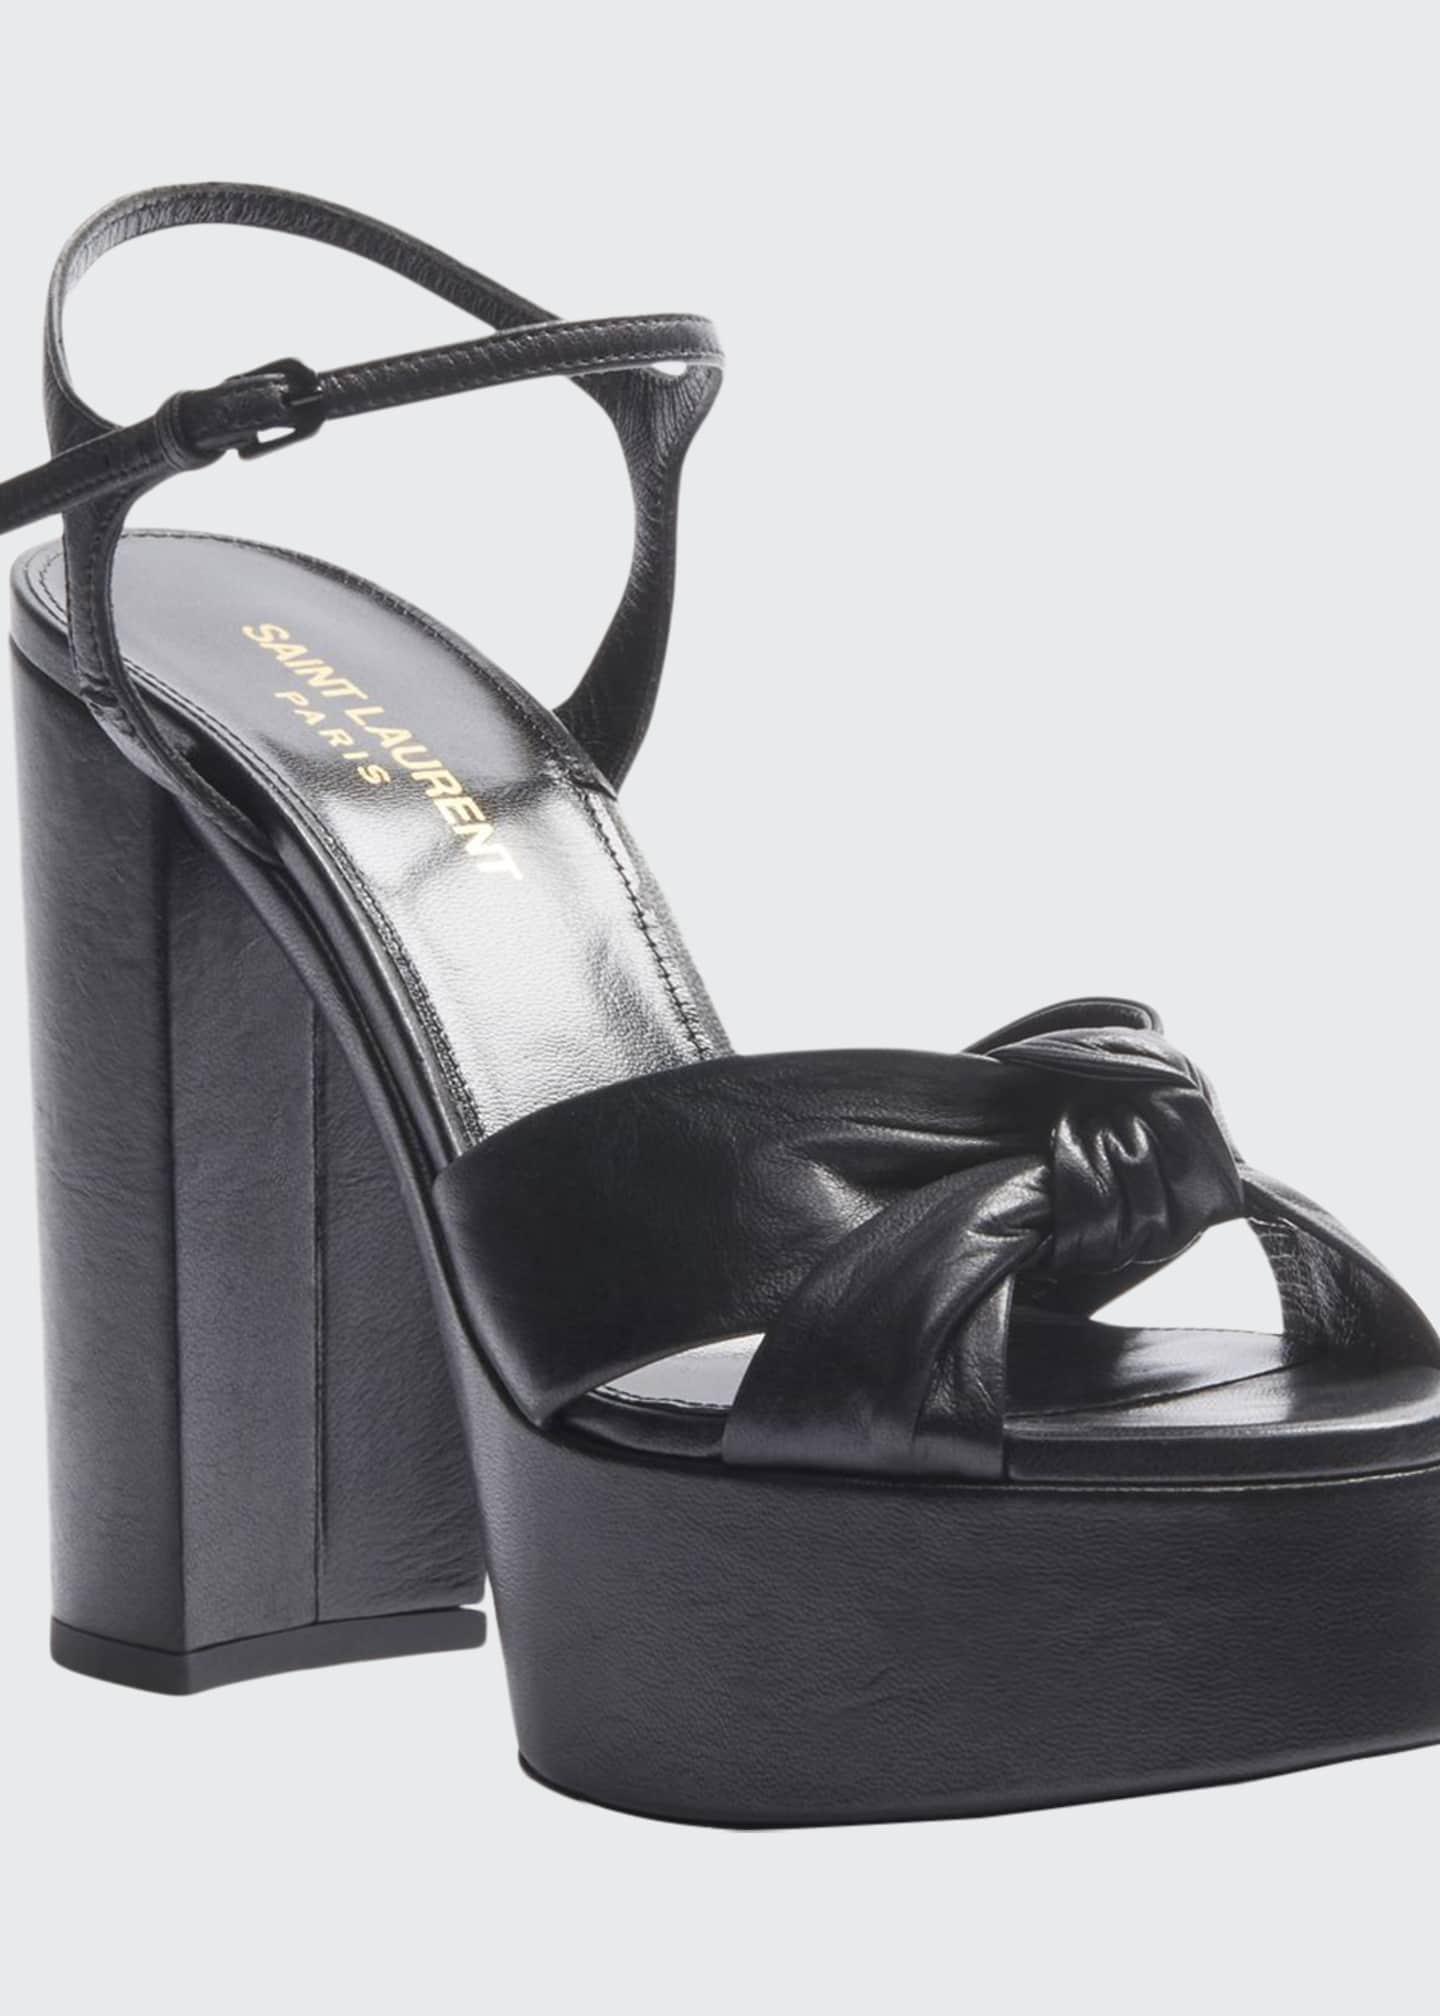 Saint Laurent Bianca Node 85mm Platform Sandals